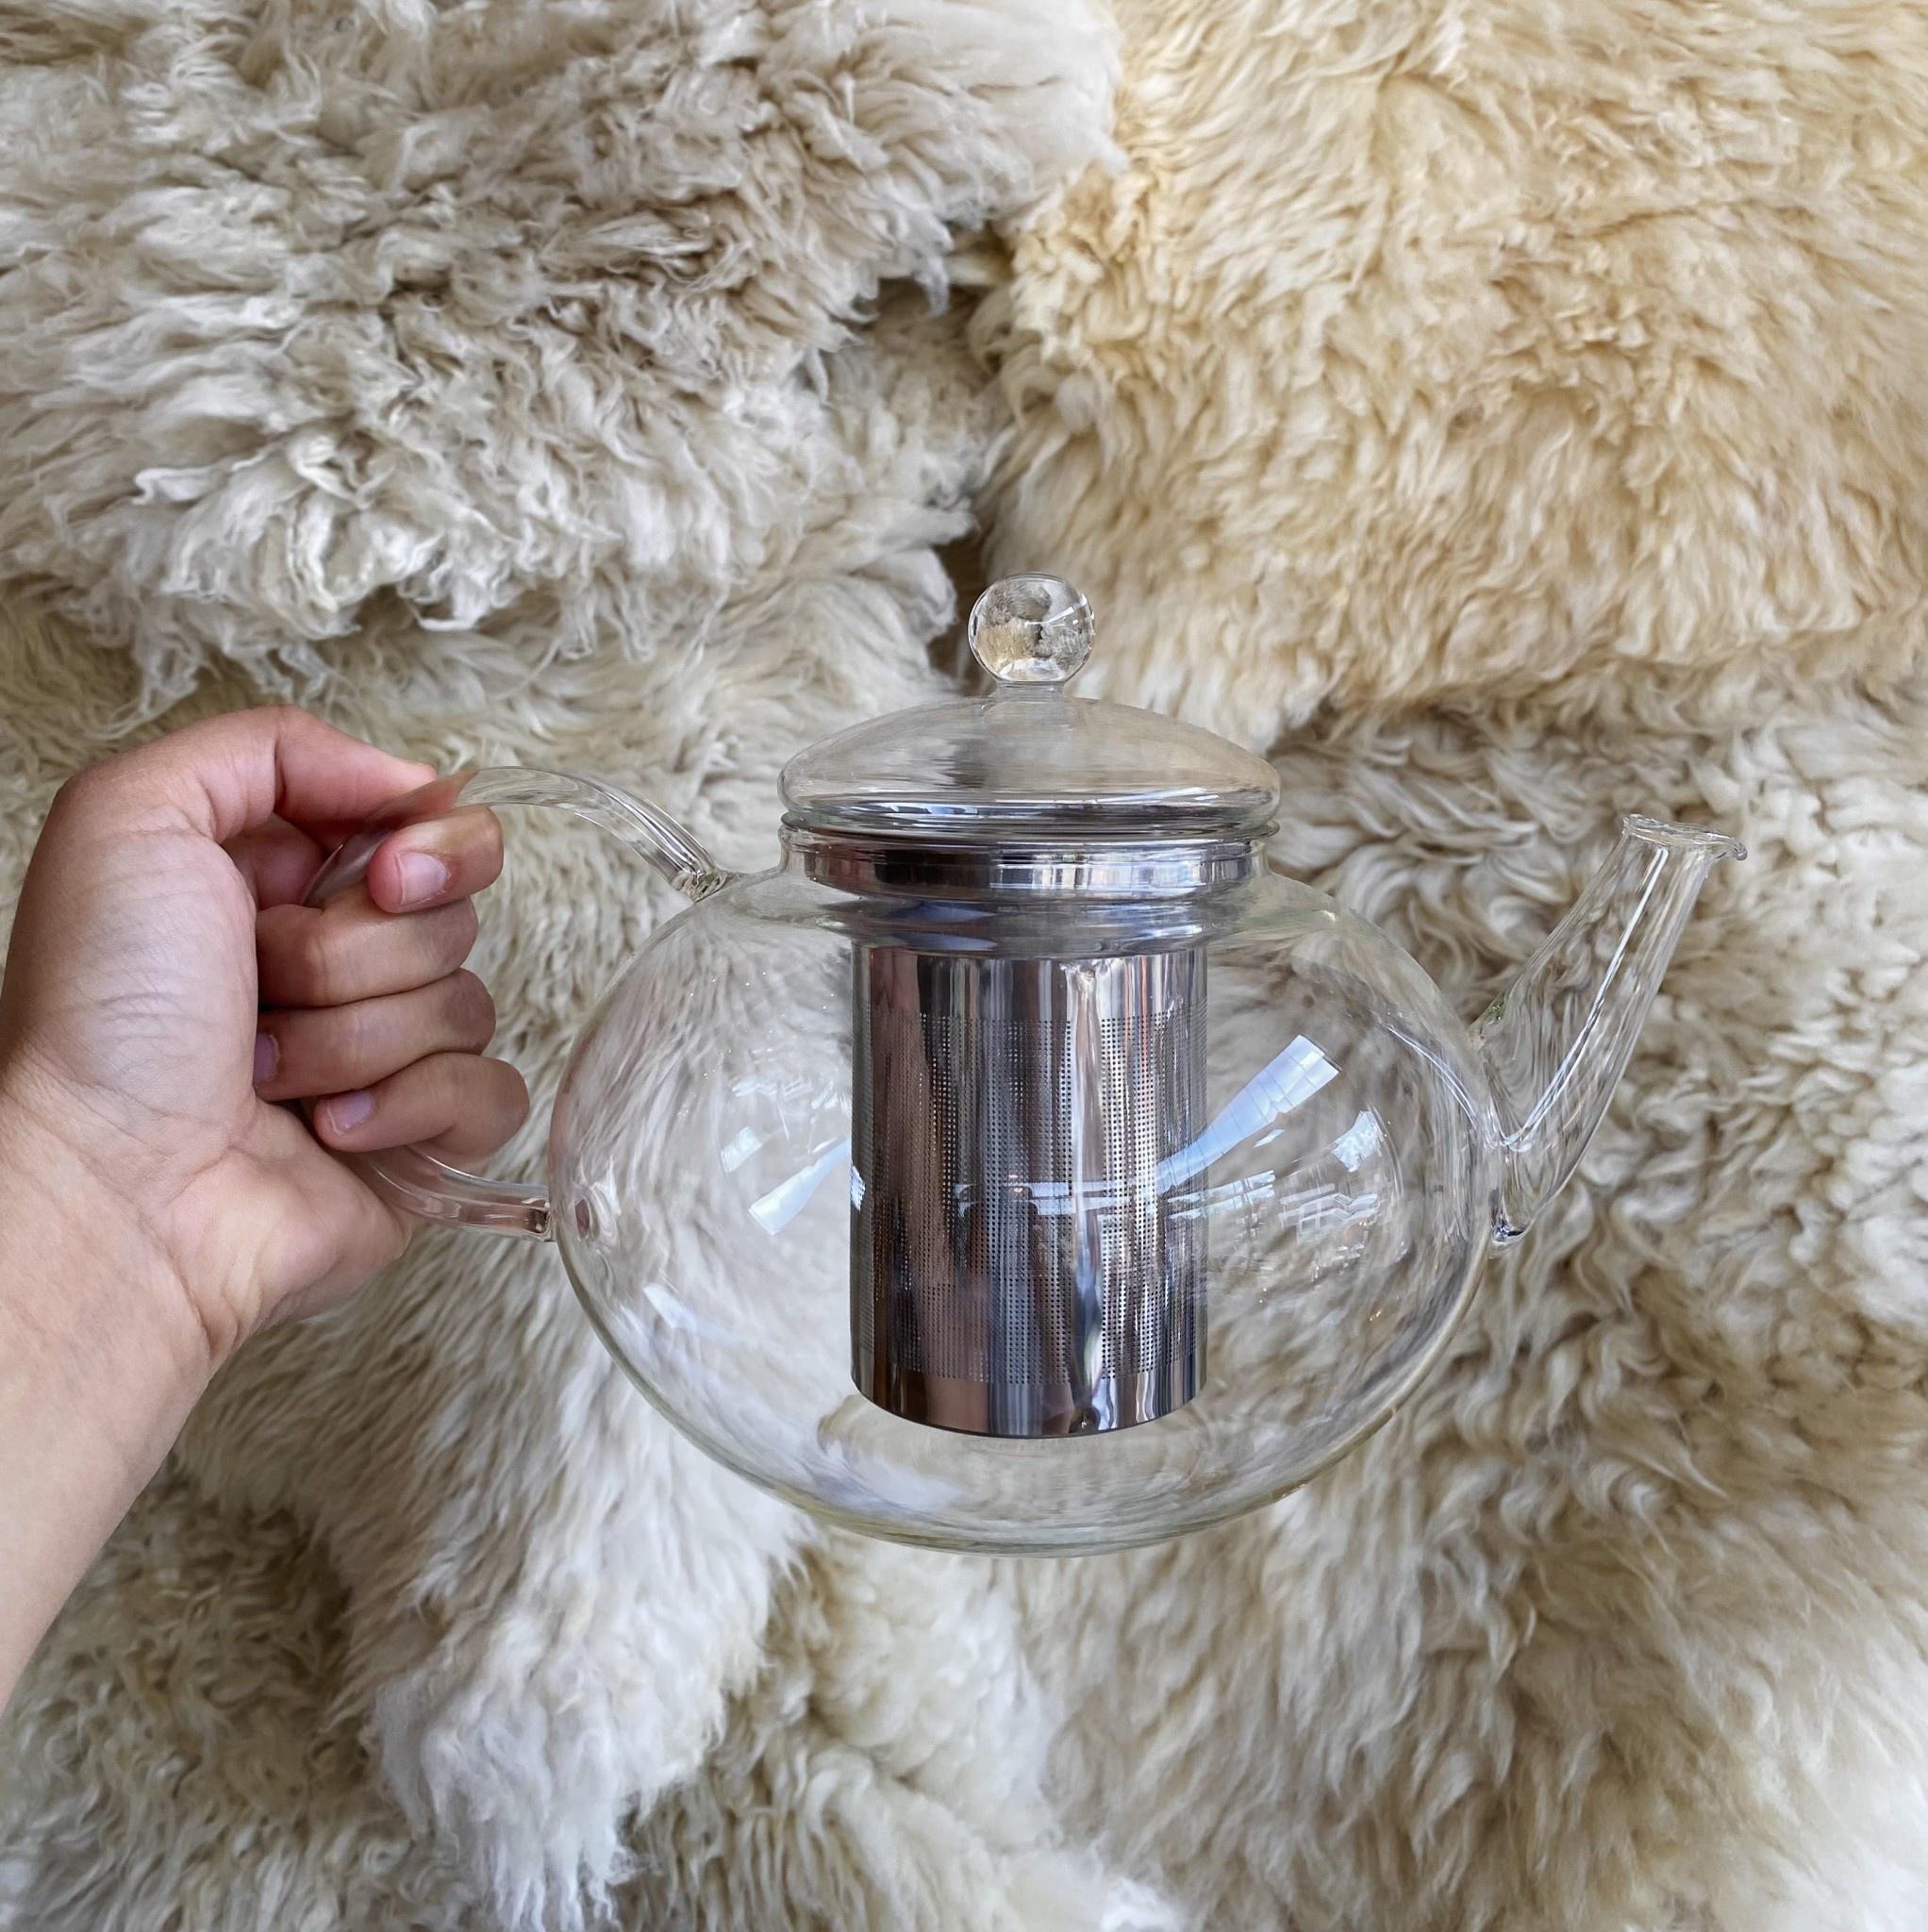 Miko Glass Teapot  - 1.2 Liter